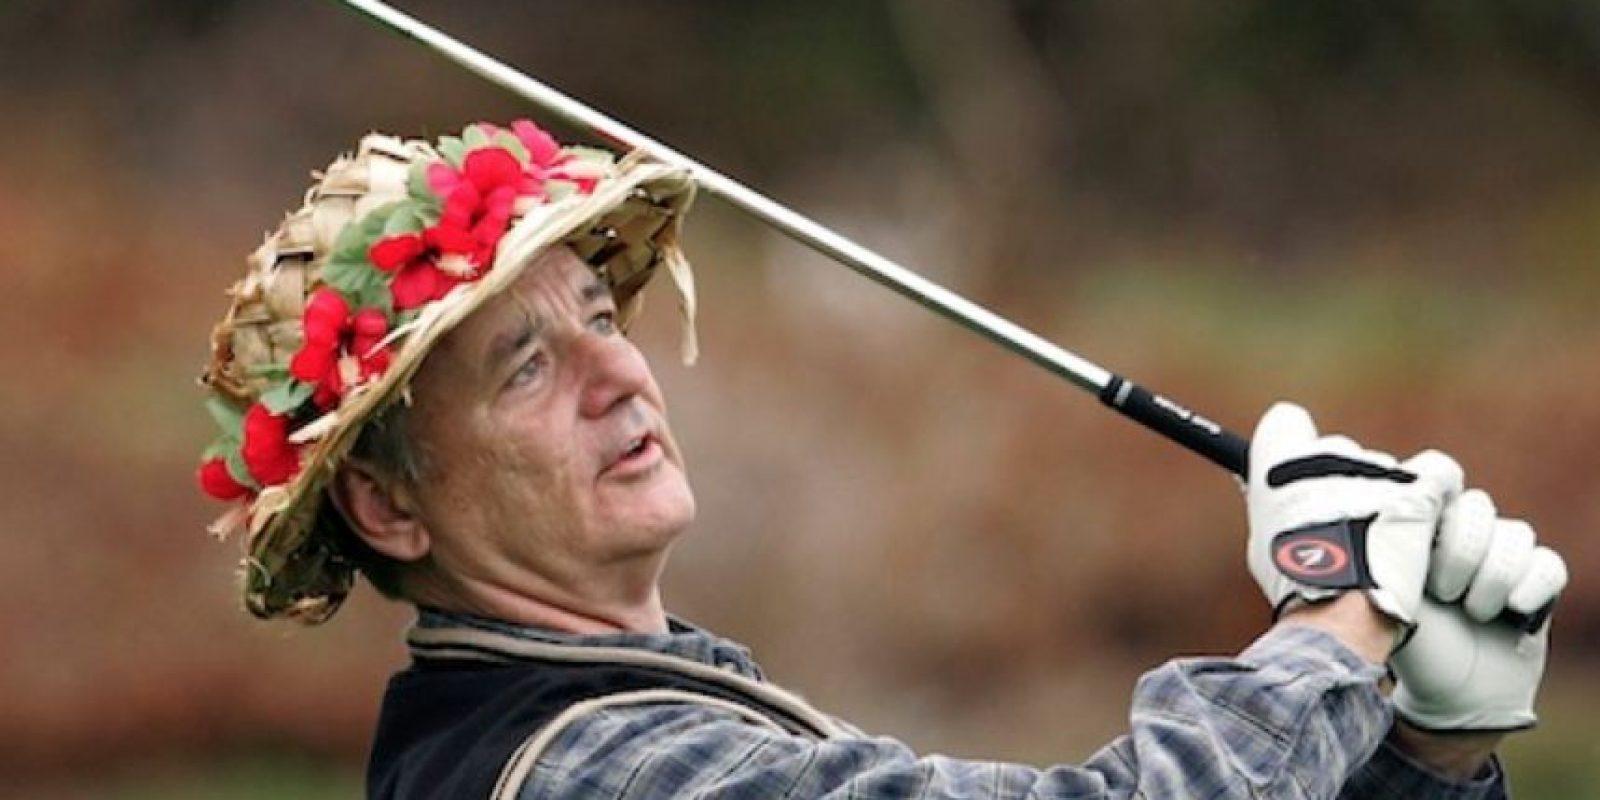 """Atrás, idiota, soy tu abuela"", dijo Bill Murray jugando golf. Foto:vía Getty Images"